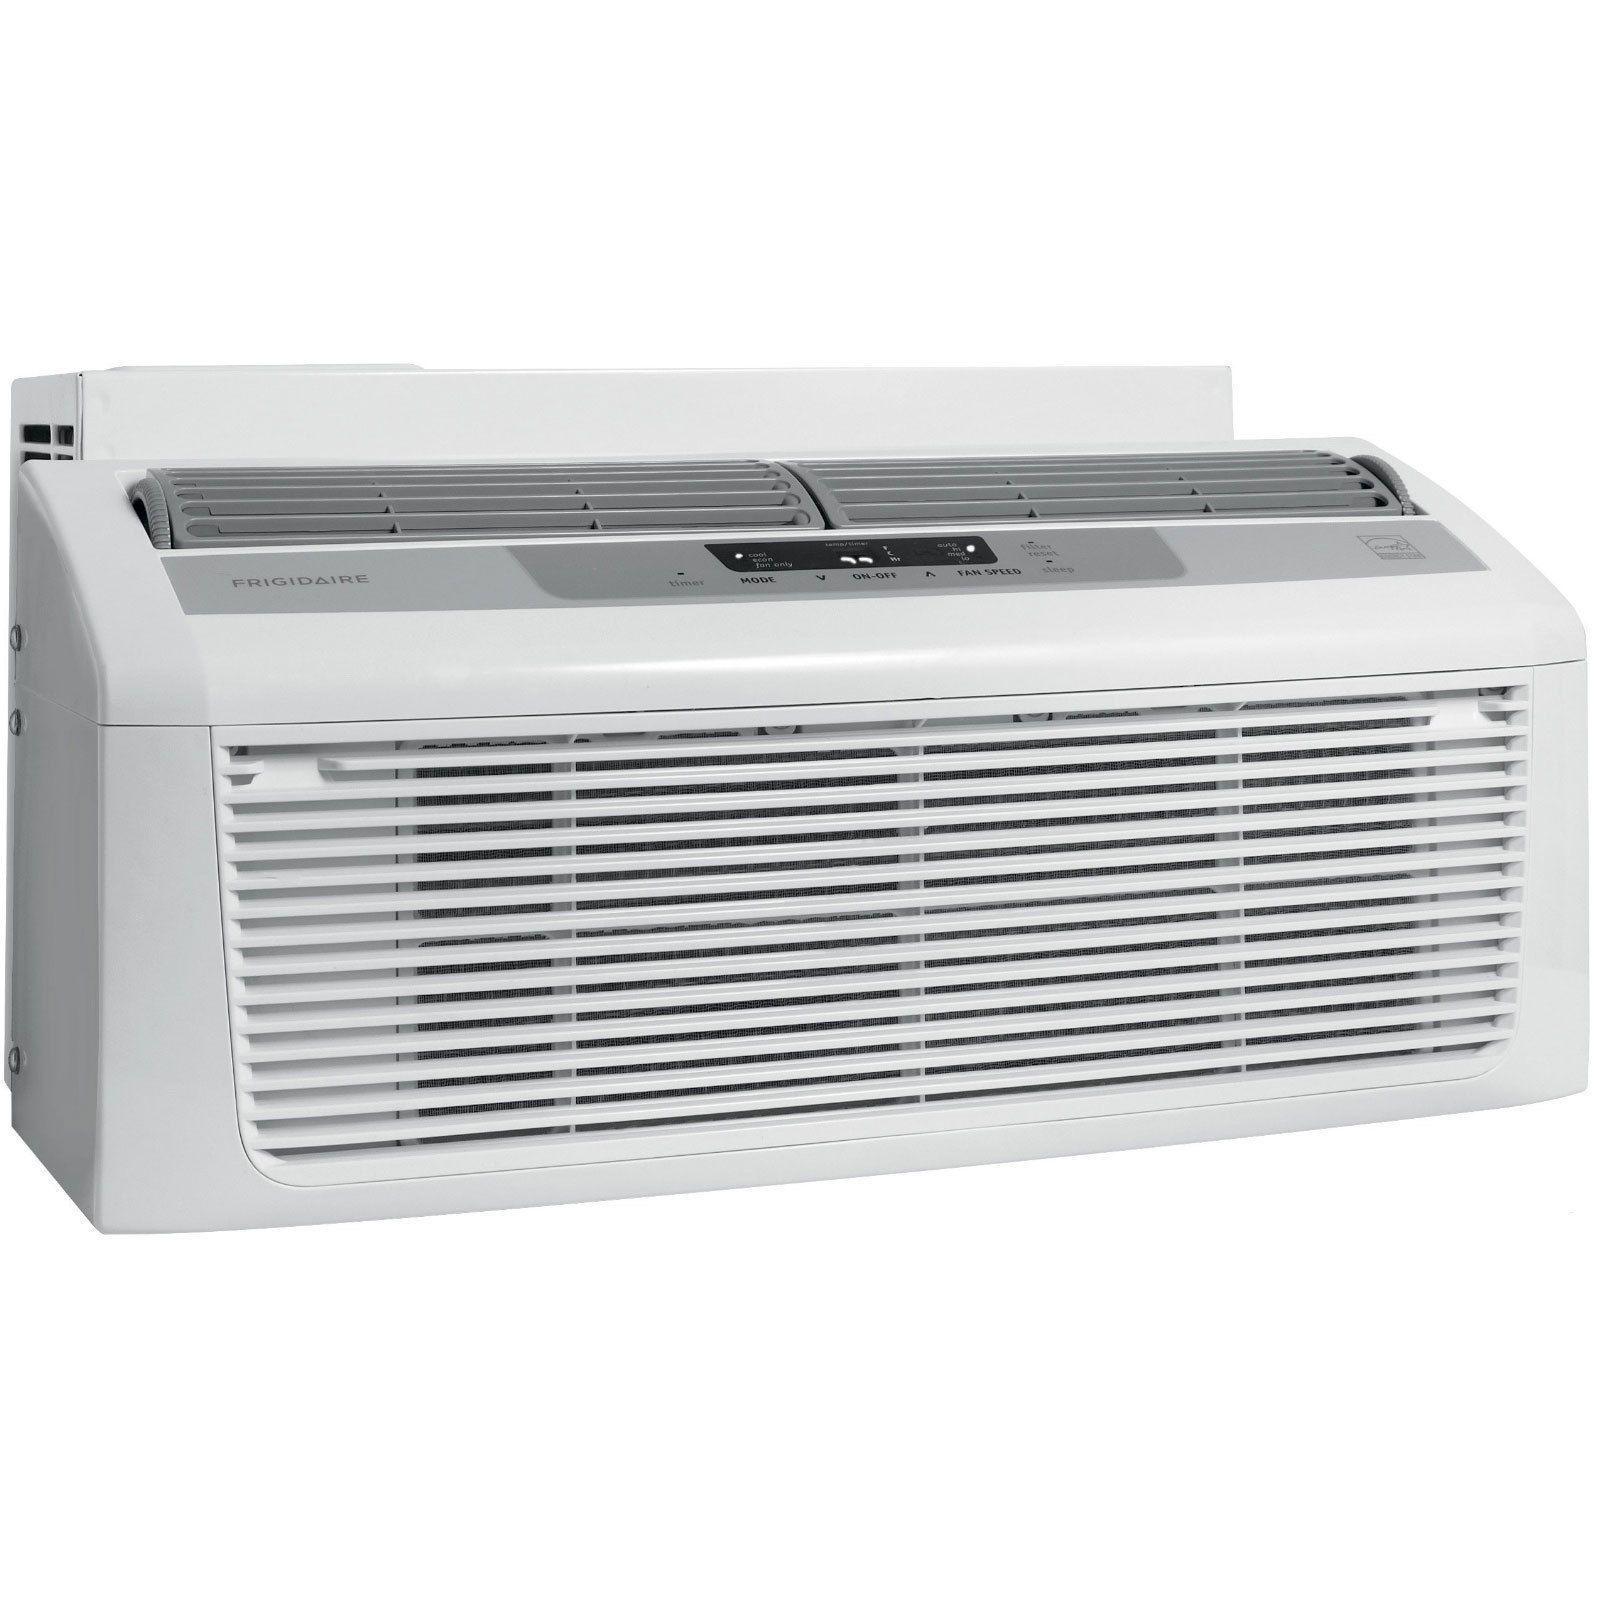 Frigidaire 6,000 Btu Low Profile Window Air Conditioner